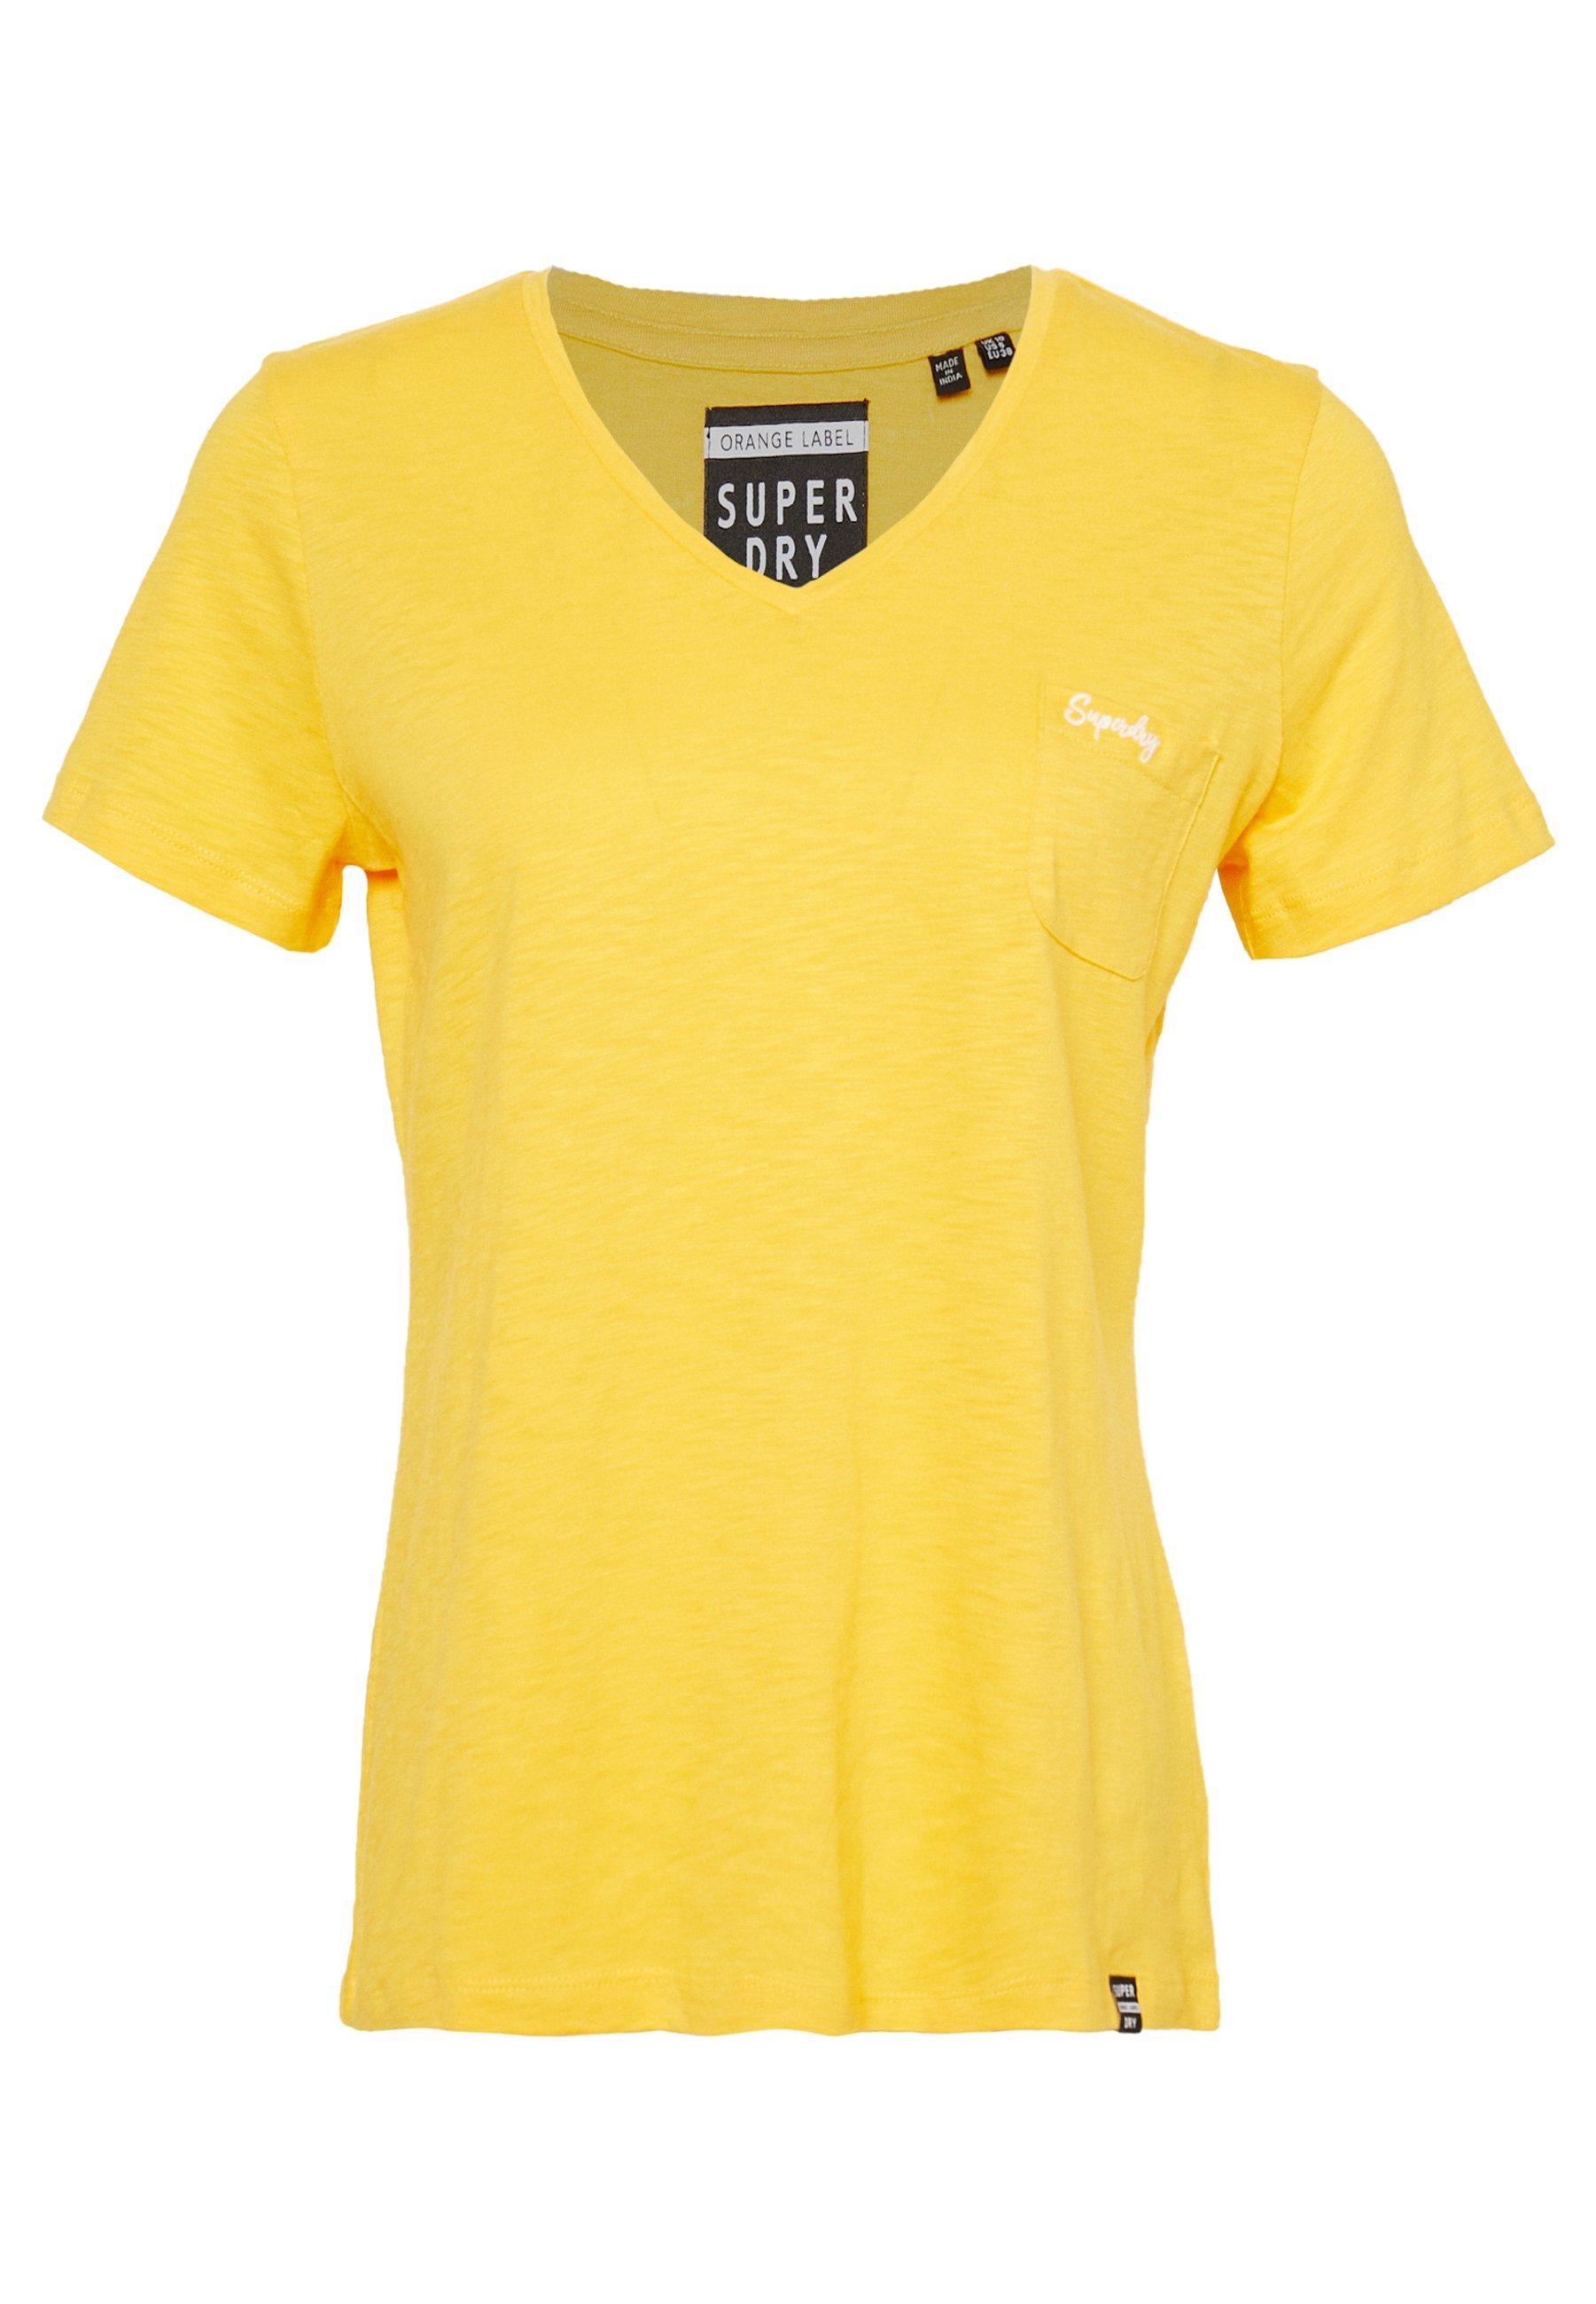 Superdry T skjorter & topper | Dame | Nye overdeler på Zalando